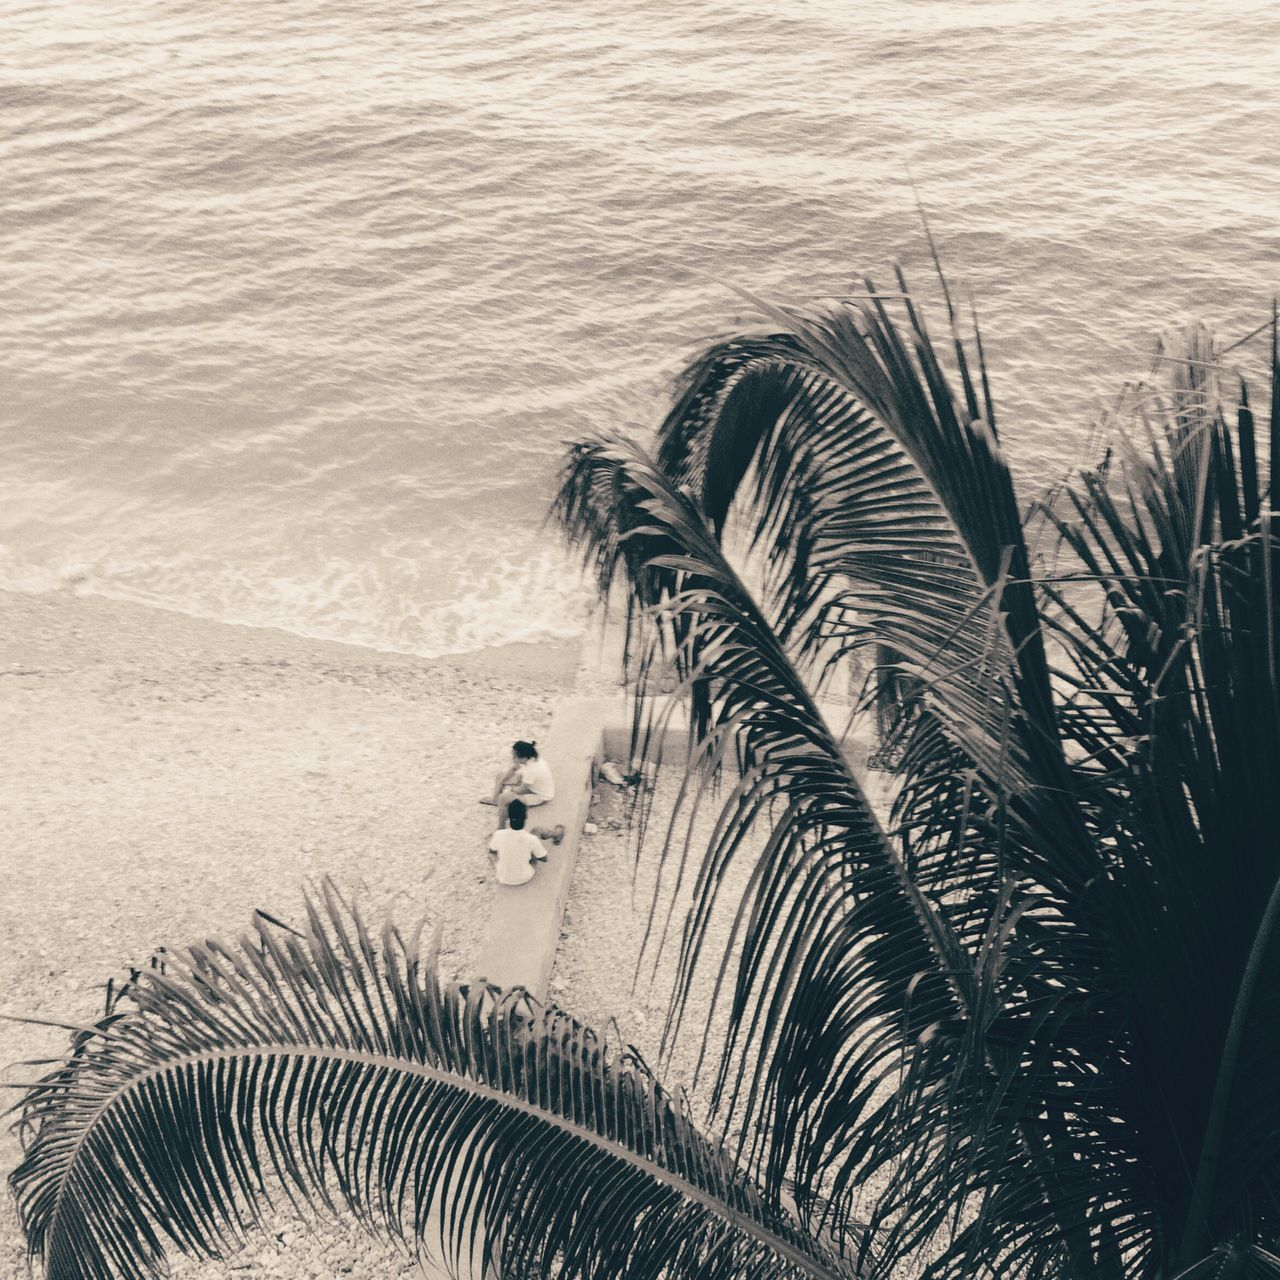 Boljoon Itsmorefuninthephilippines Cebu Island Island Life People Watching Sea Sepia Palm Tree Palm Tree Leaves Palm